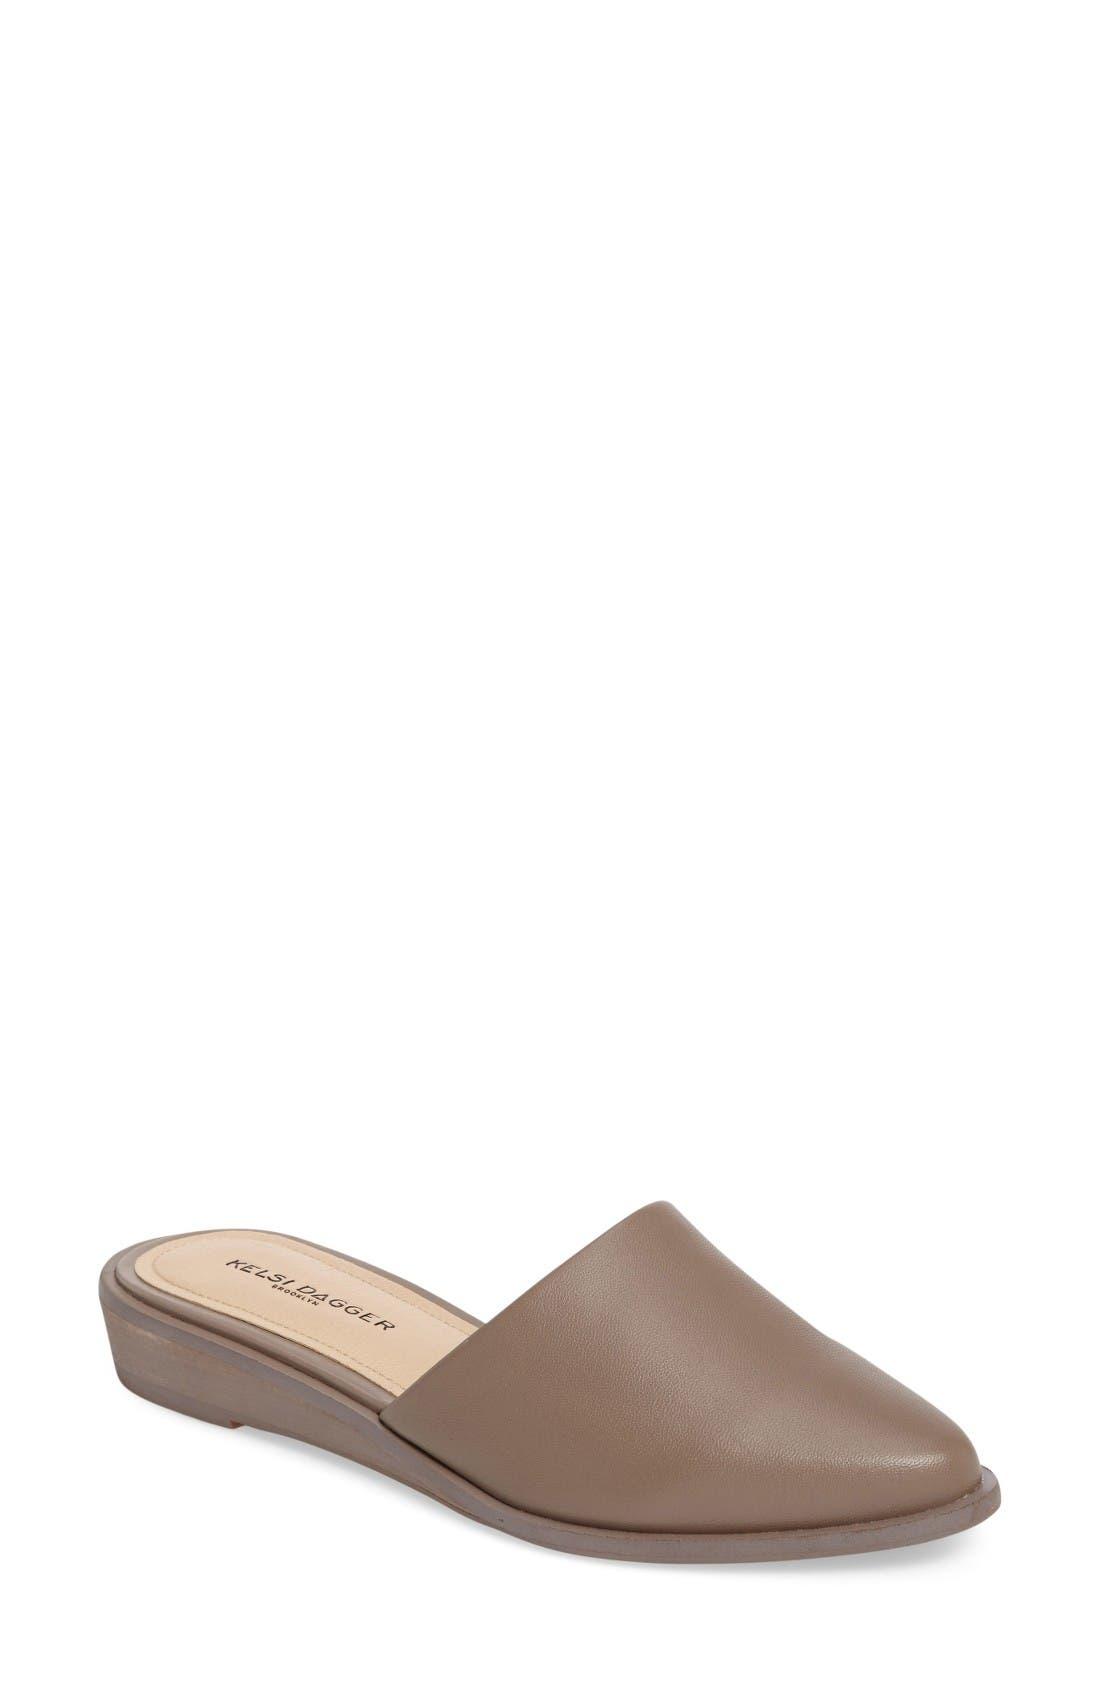 2018 Discount Amory Wedge Slide Women Womens Portobello Leather Kelsi Dagger Brooklyn Womens Shoes